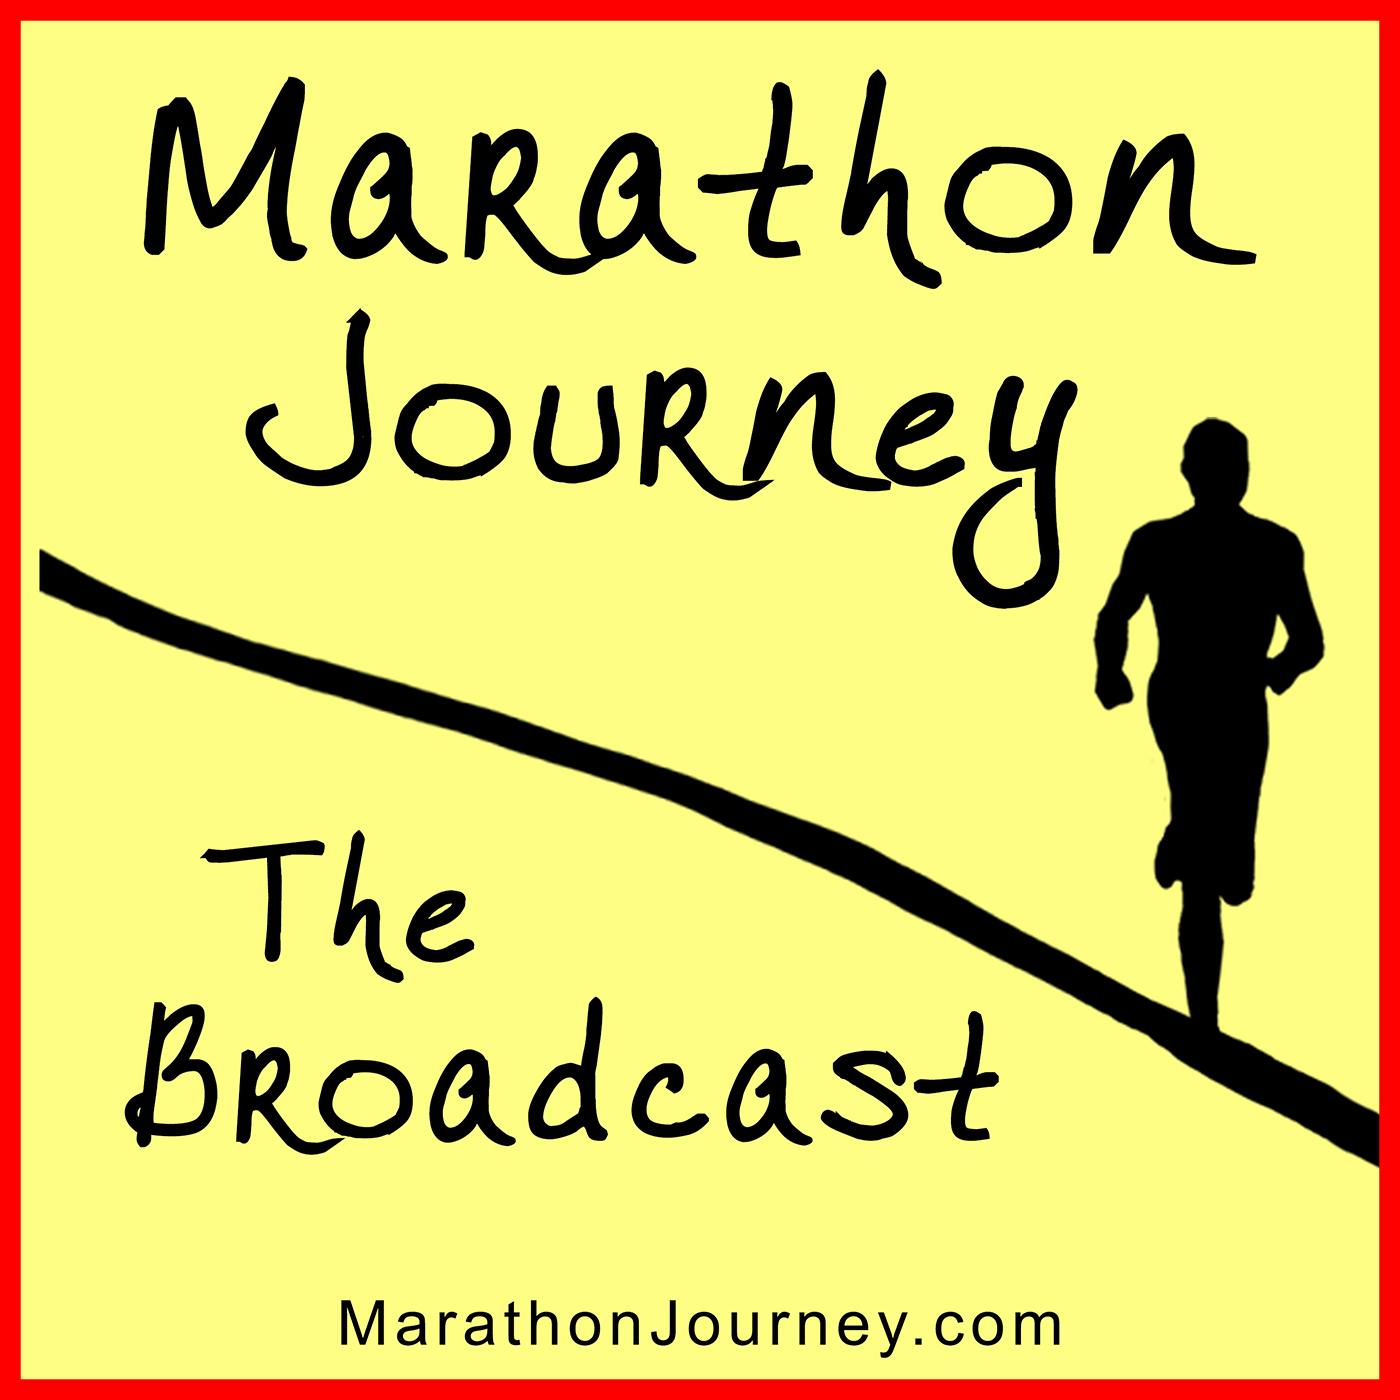 MJTB047 - Surgical Artistry Modesto Marathon